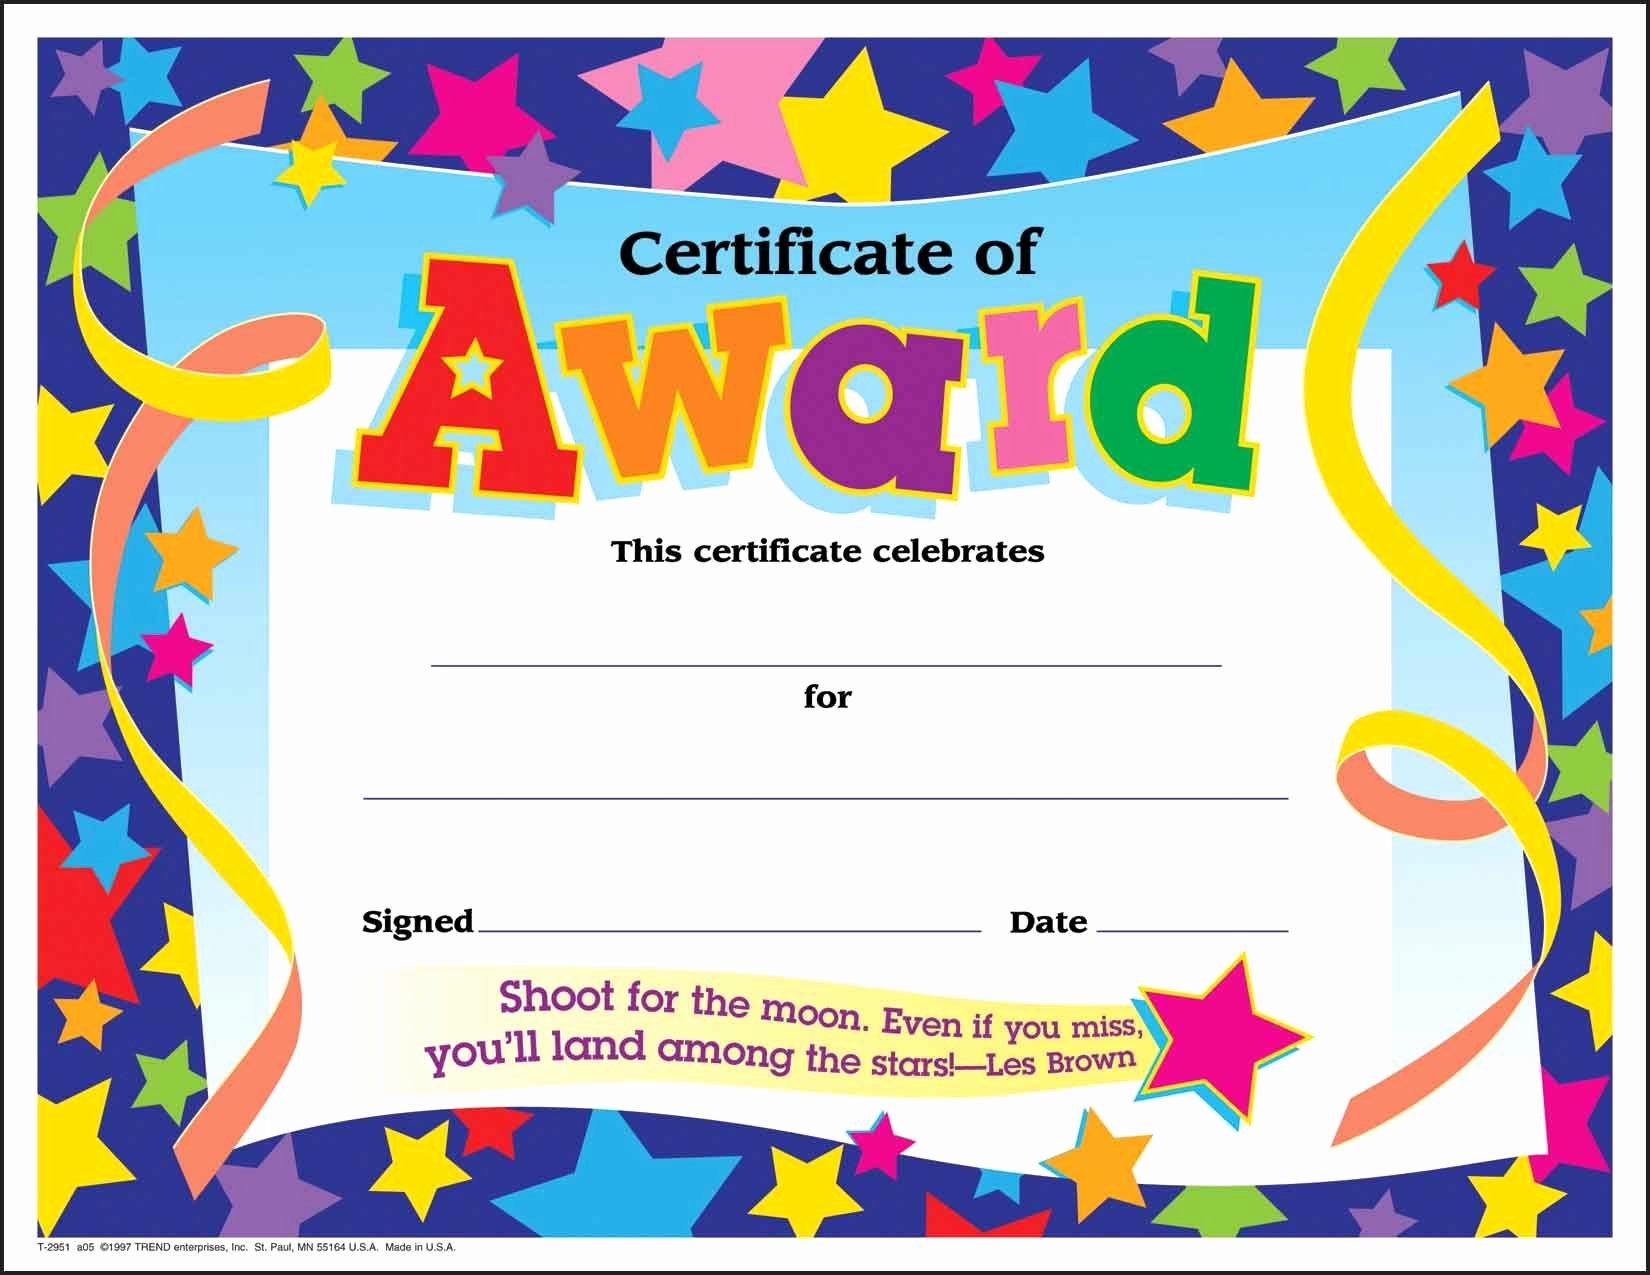 Free Preschool Certificate Templates Elegant Certificate Template for Kids Free Certificate Templates